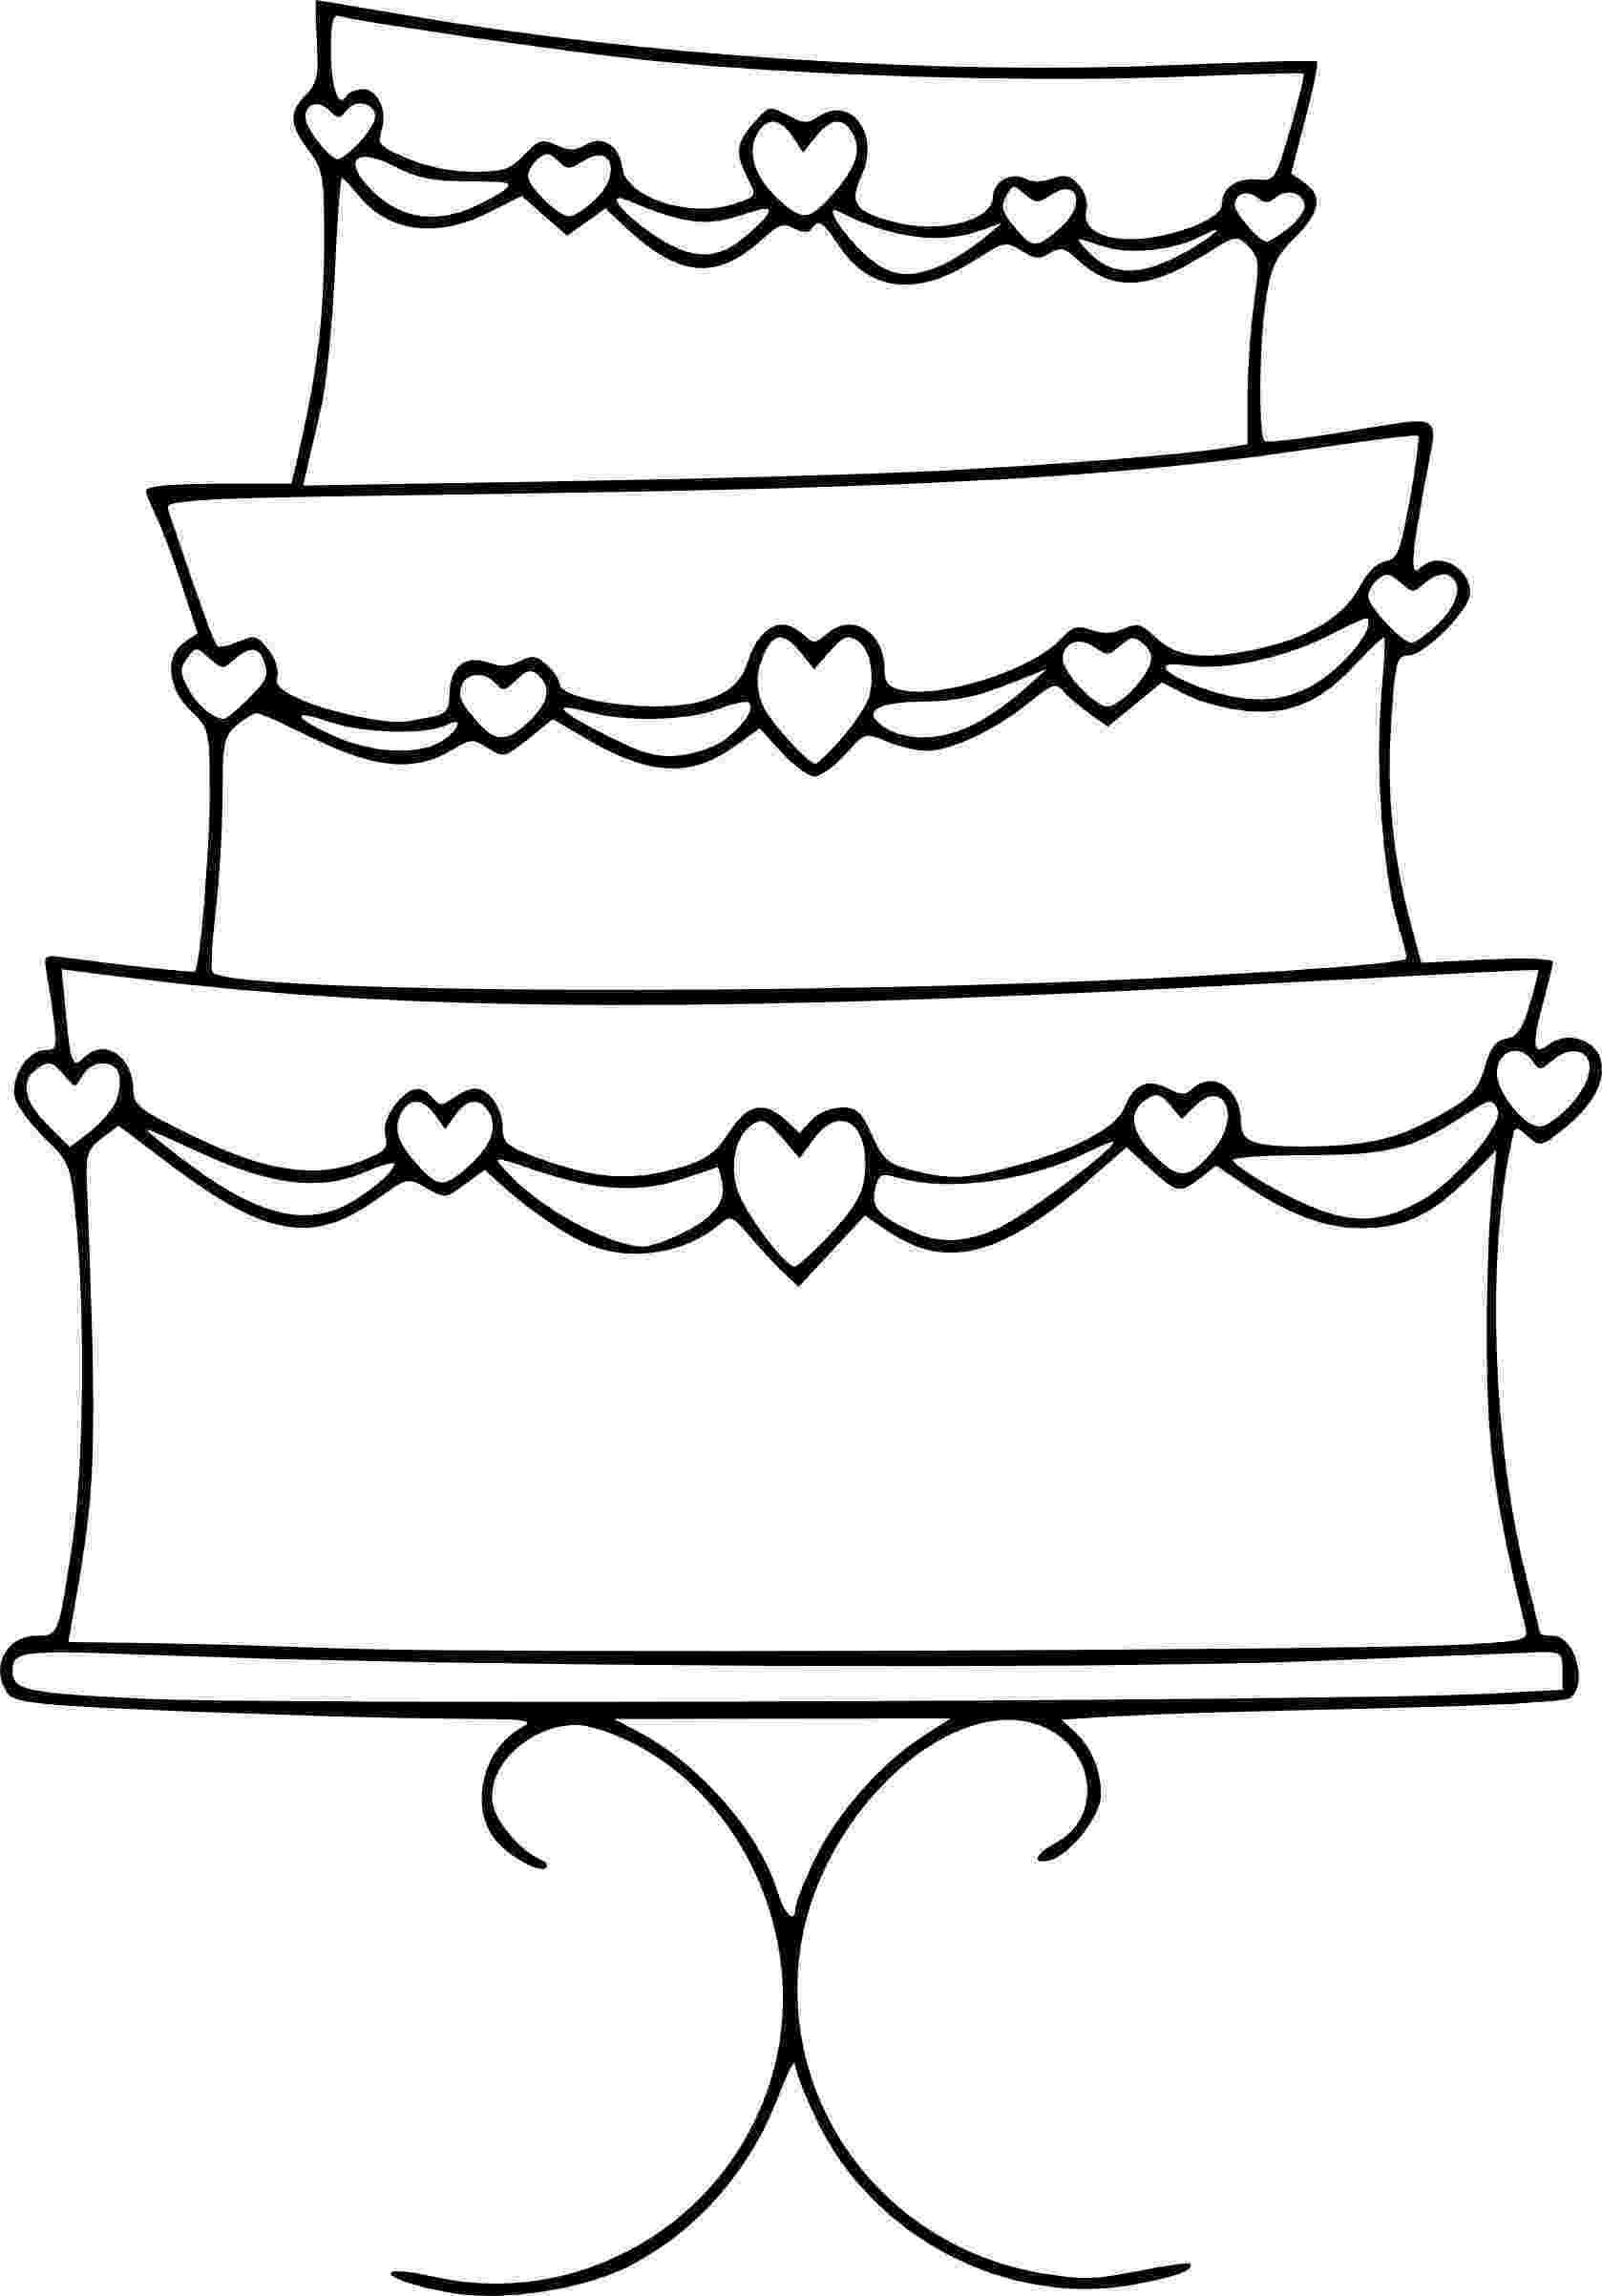 cake printable dulemba coloring page tuesdays birthday cake for 5th cake printable